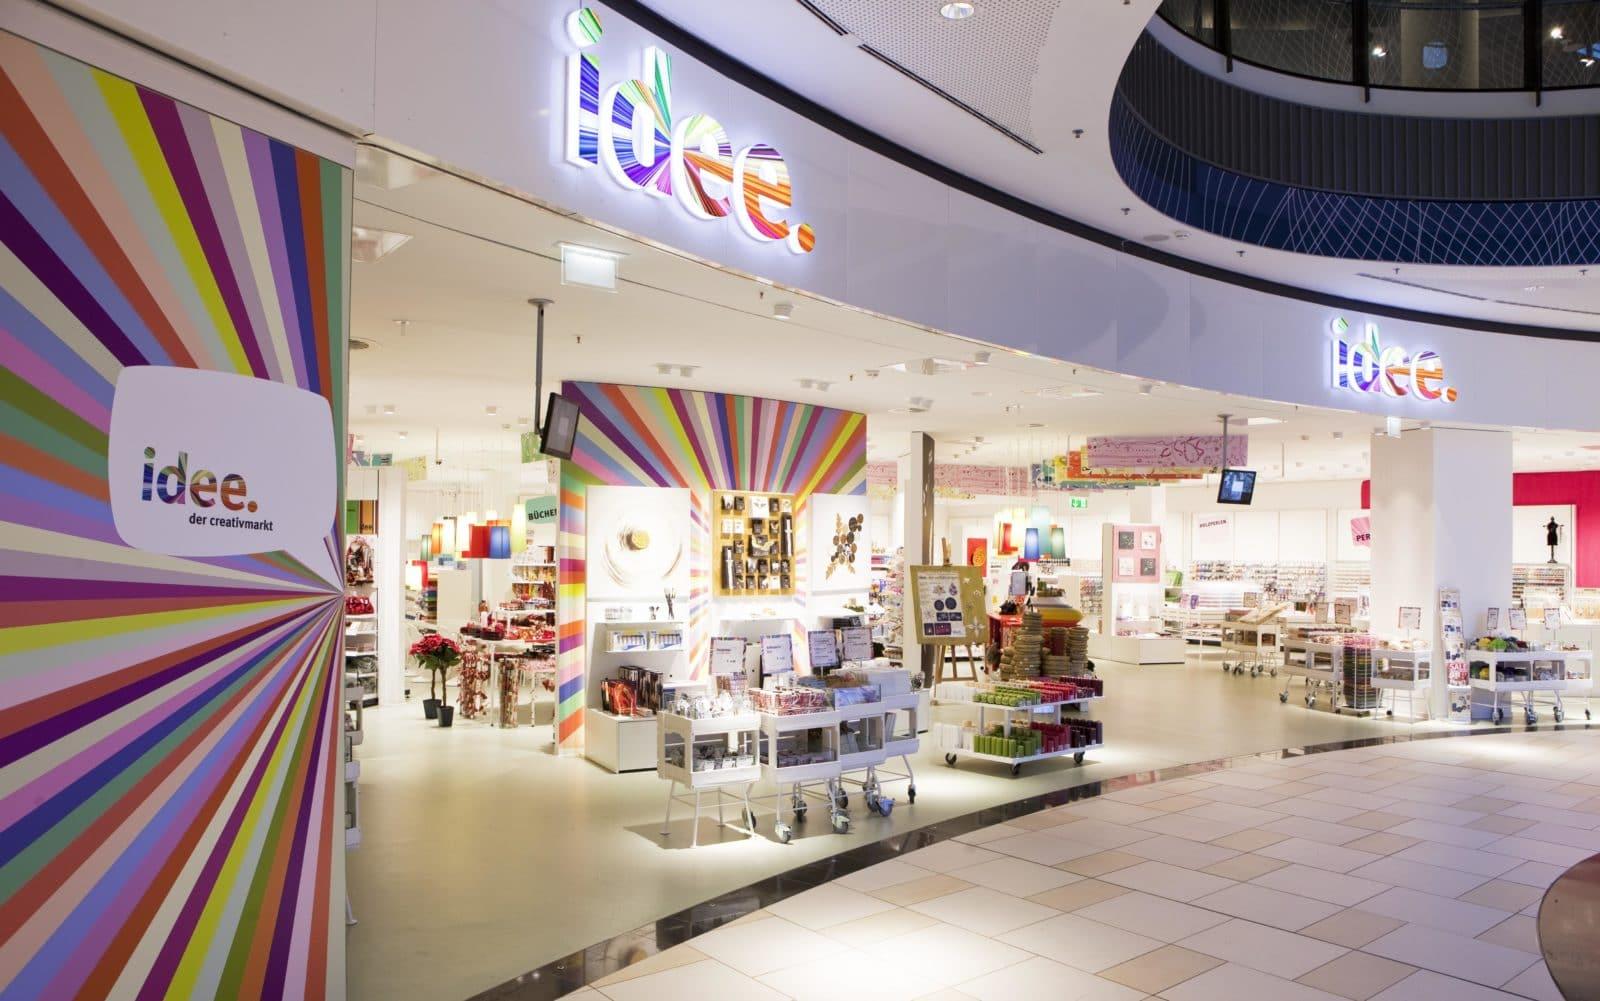 Idee creativmarkt gesch fte bei handmade kultur Deko shop hannover